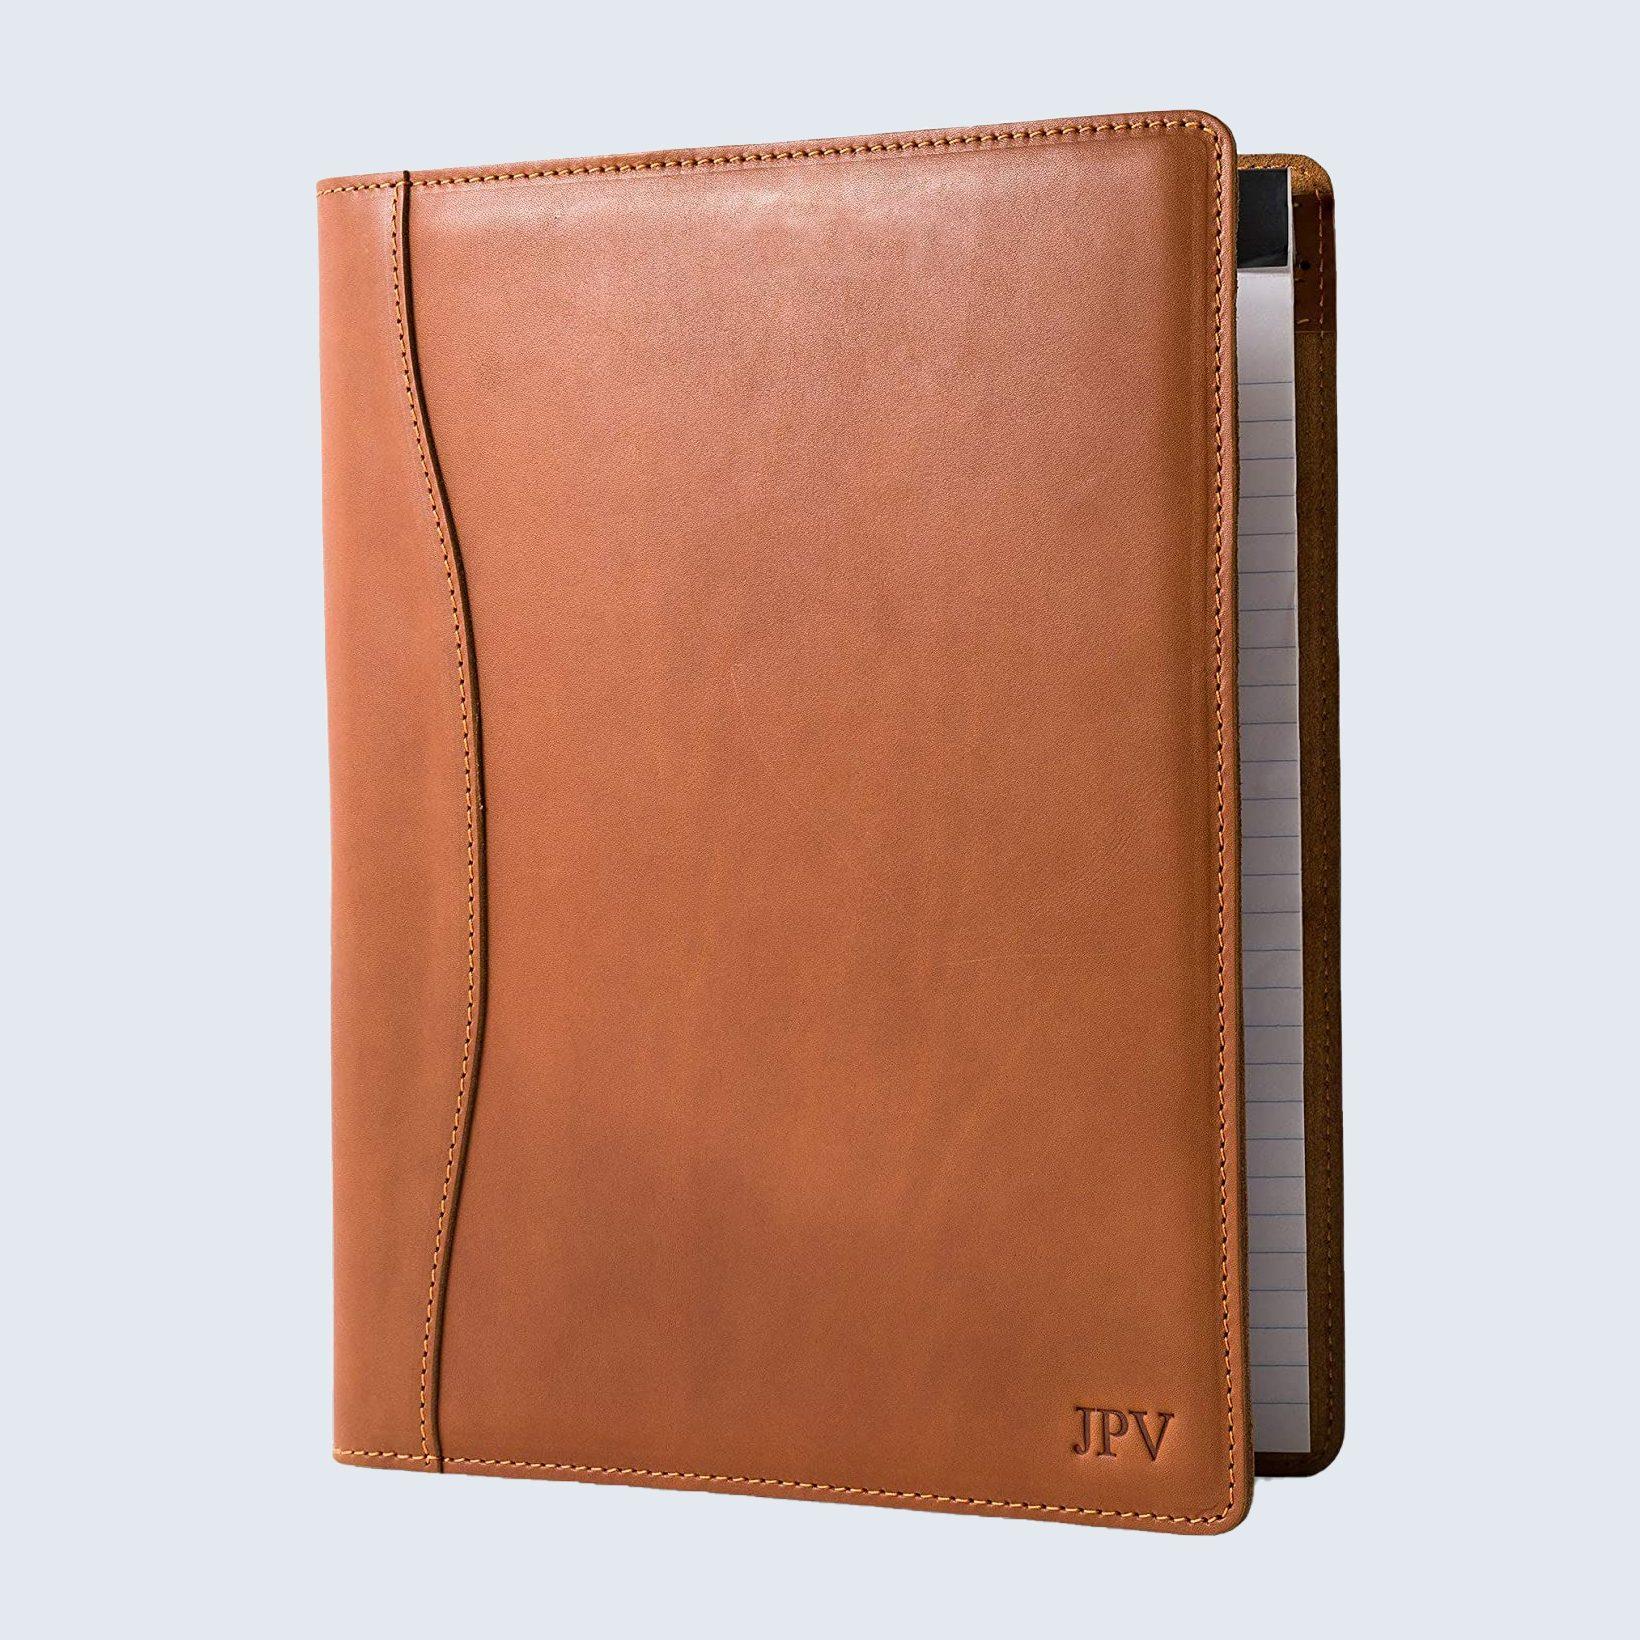 Personalized leather portfolio